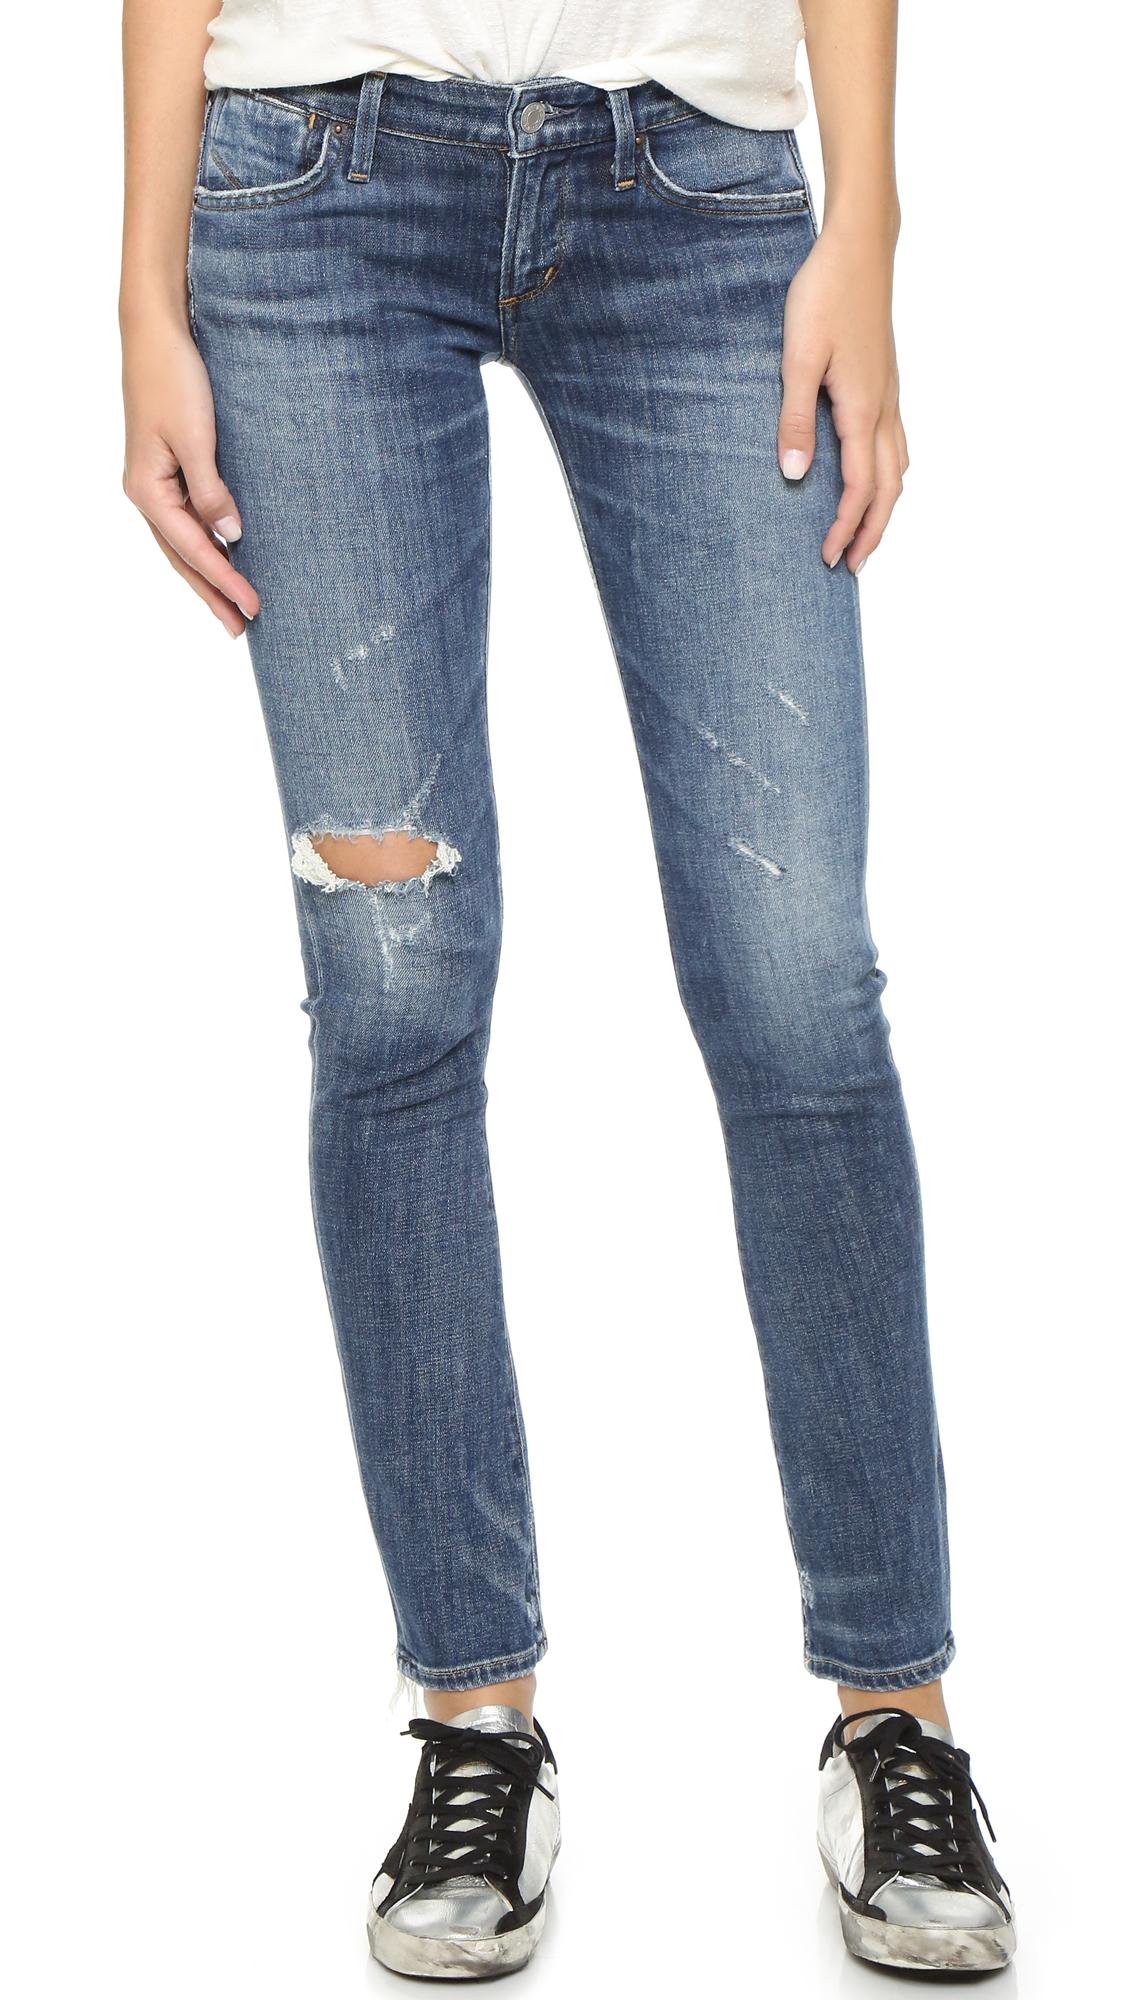 Agolde Chloe Low Rise Slim Jeans - Starwood at Shopbop